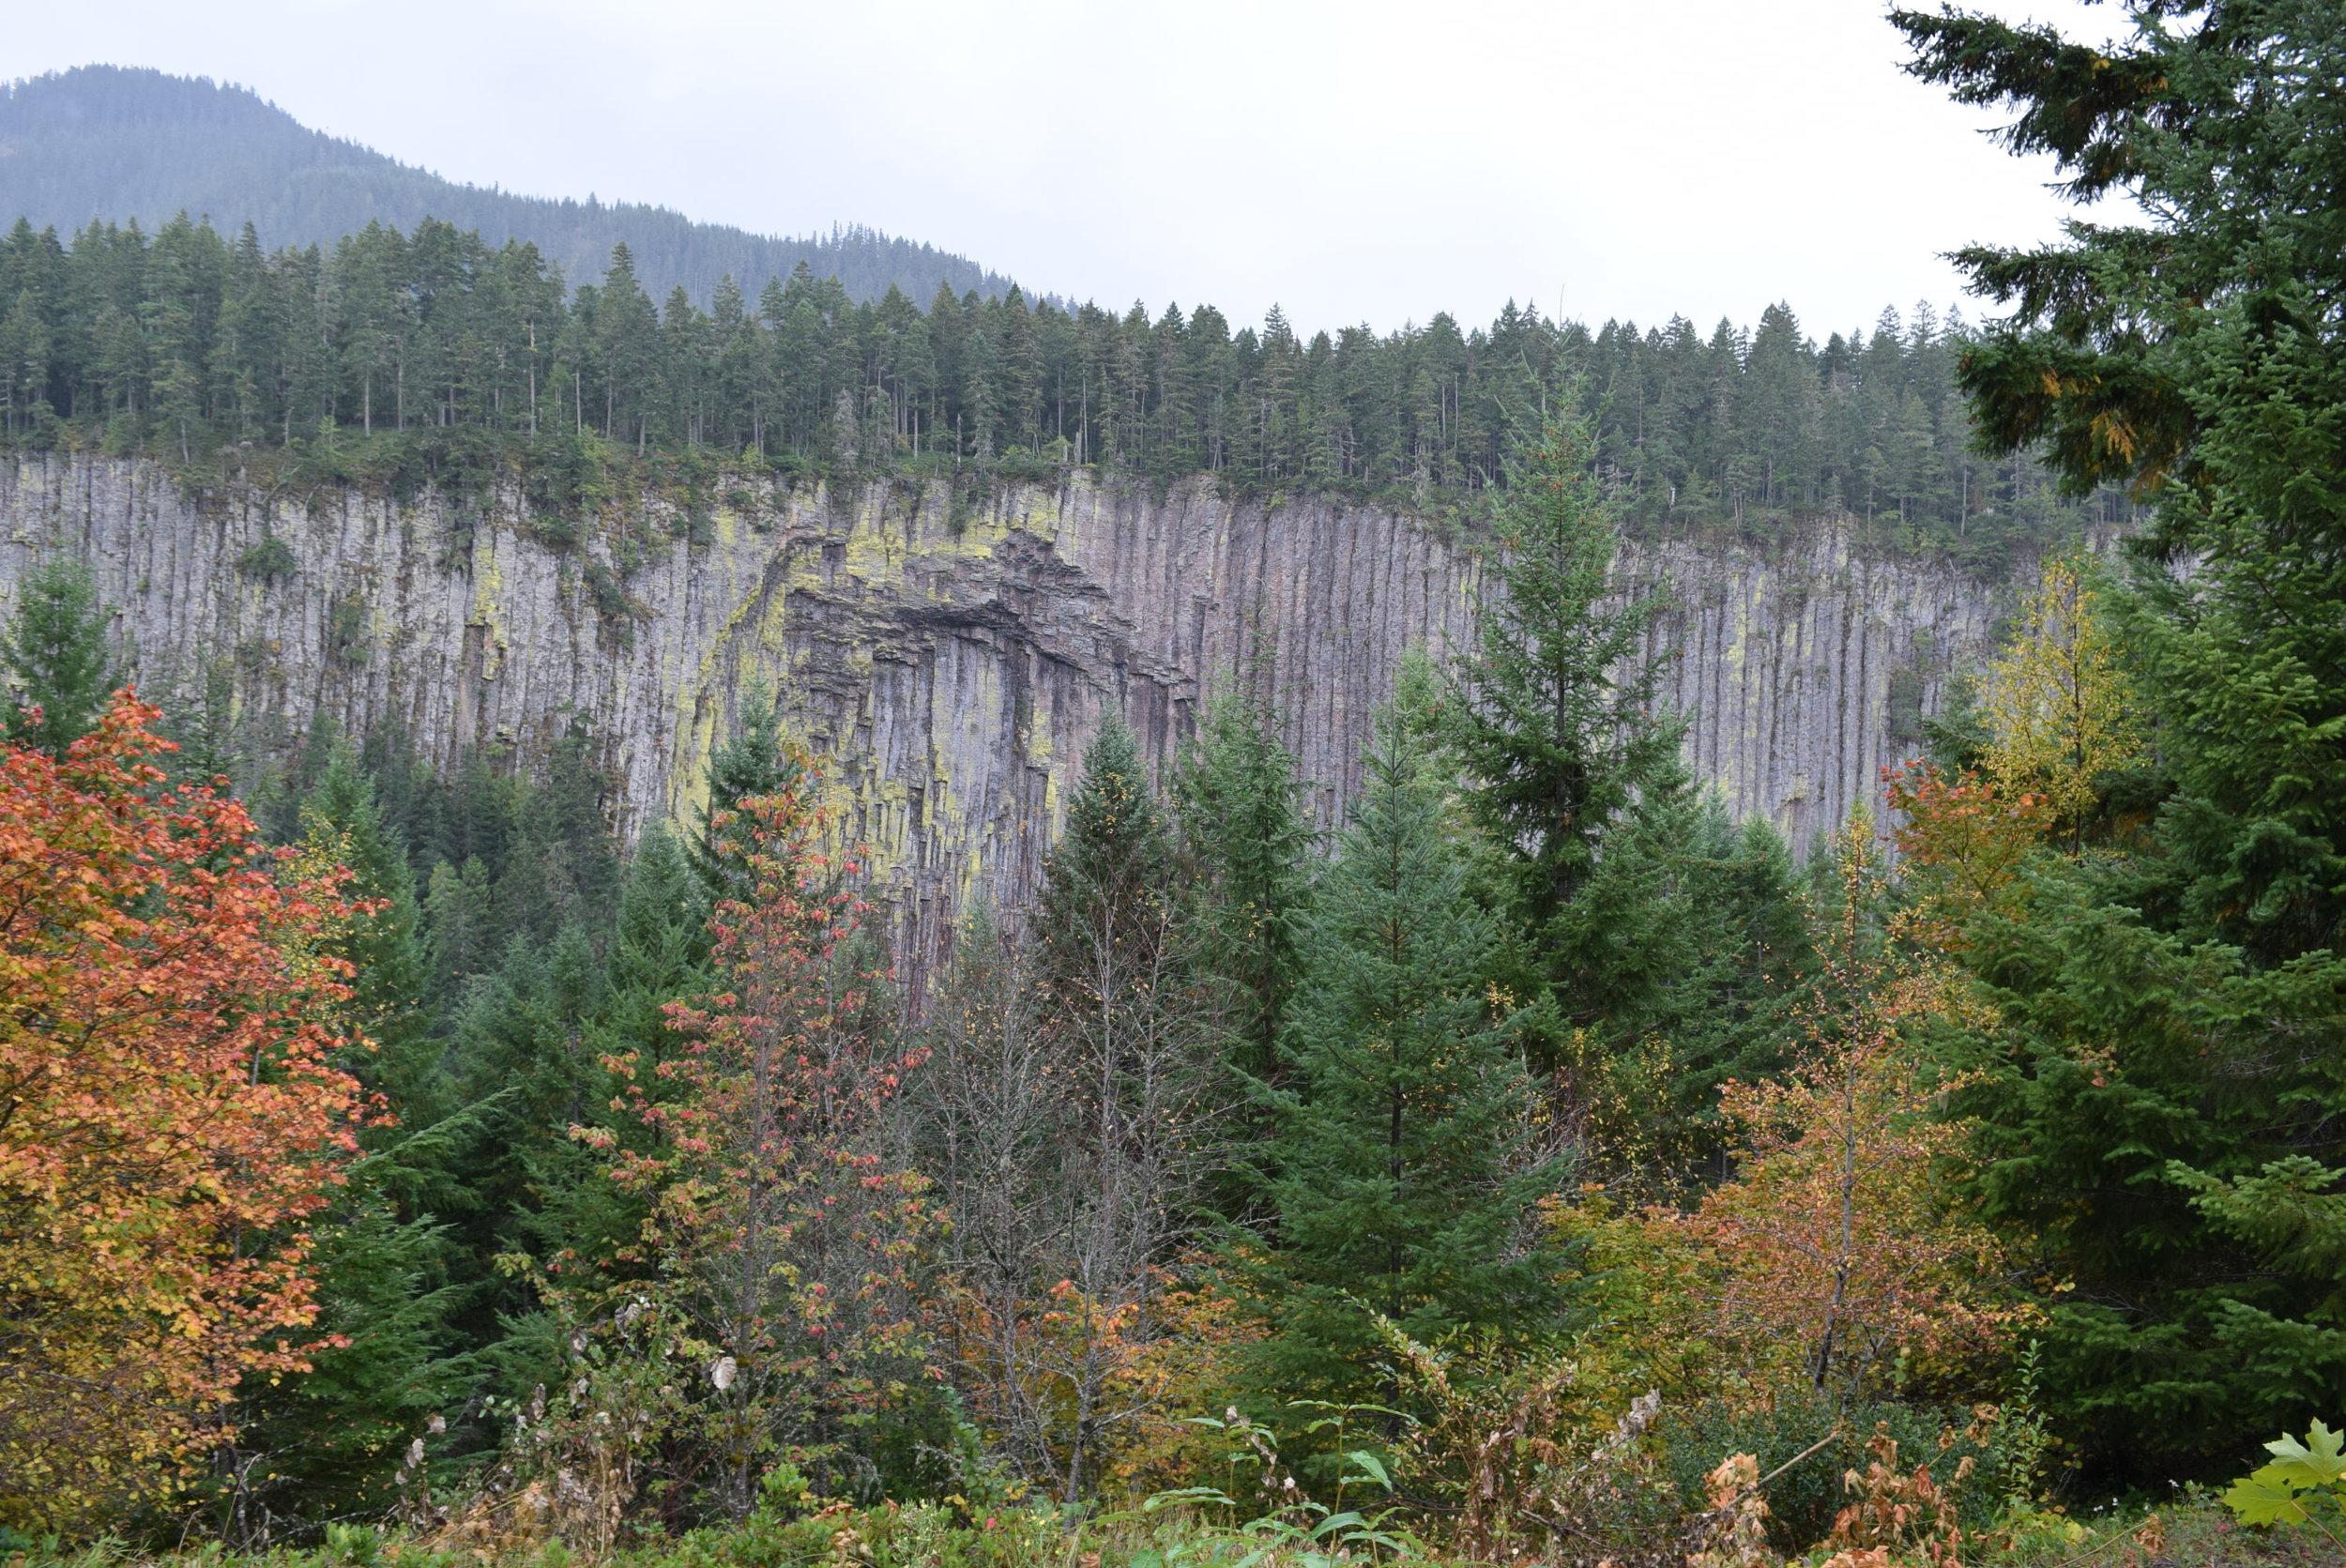 Evidence of past volcanic activity near Mount Rainier.